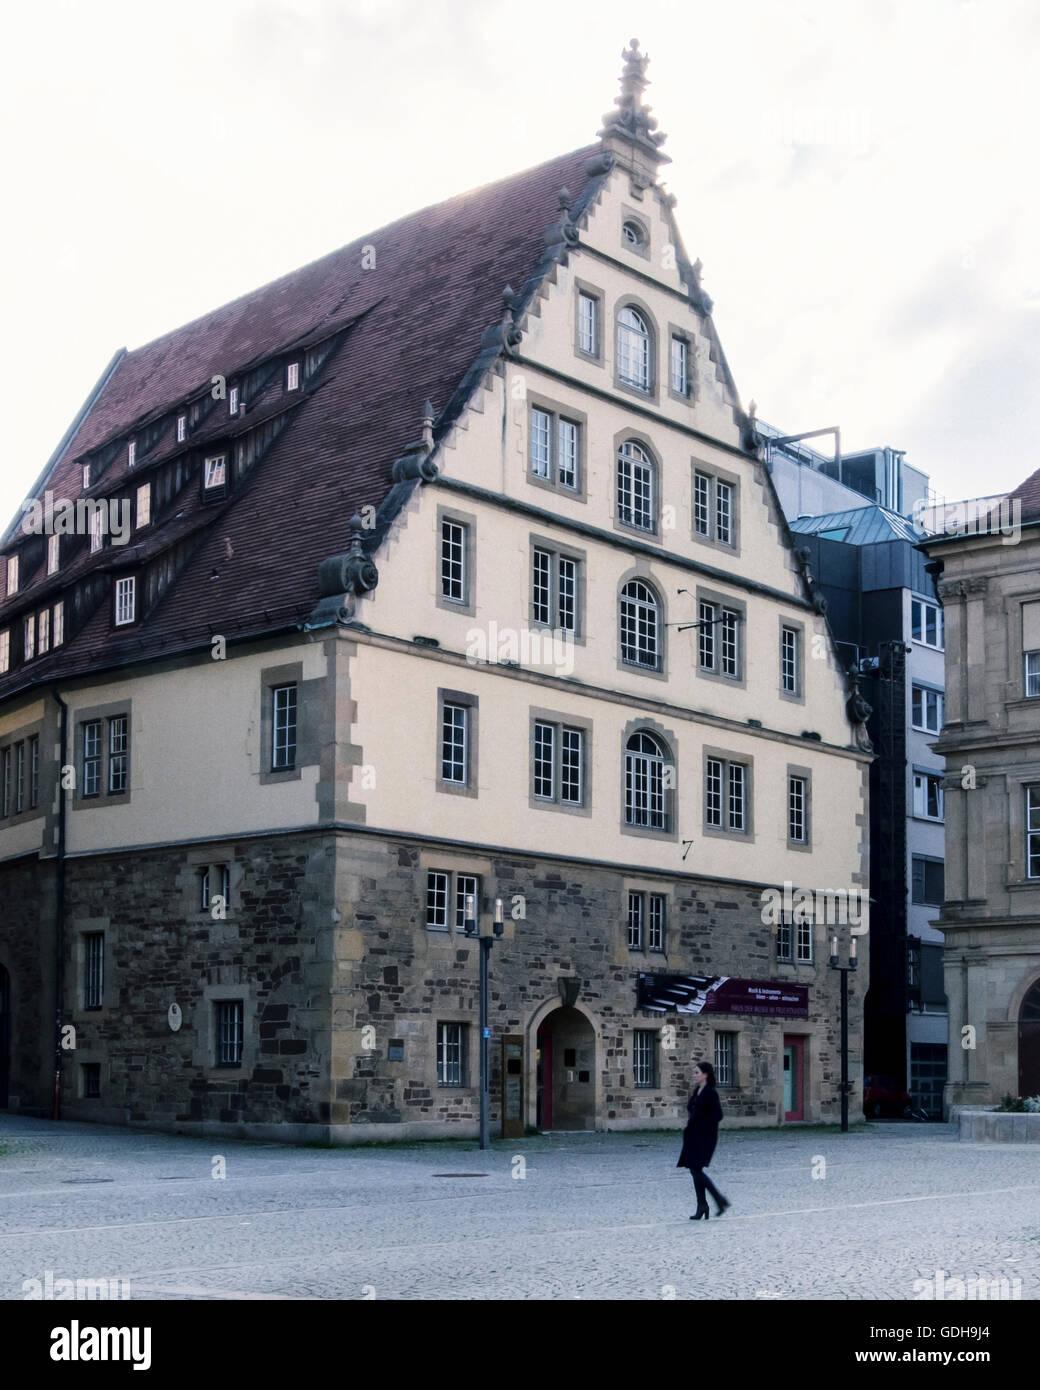 Historic old Fruchtkasten building reconstruction on Schillerplatz, Schiller Square, Stuttgart, Germany - Stock Image